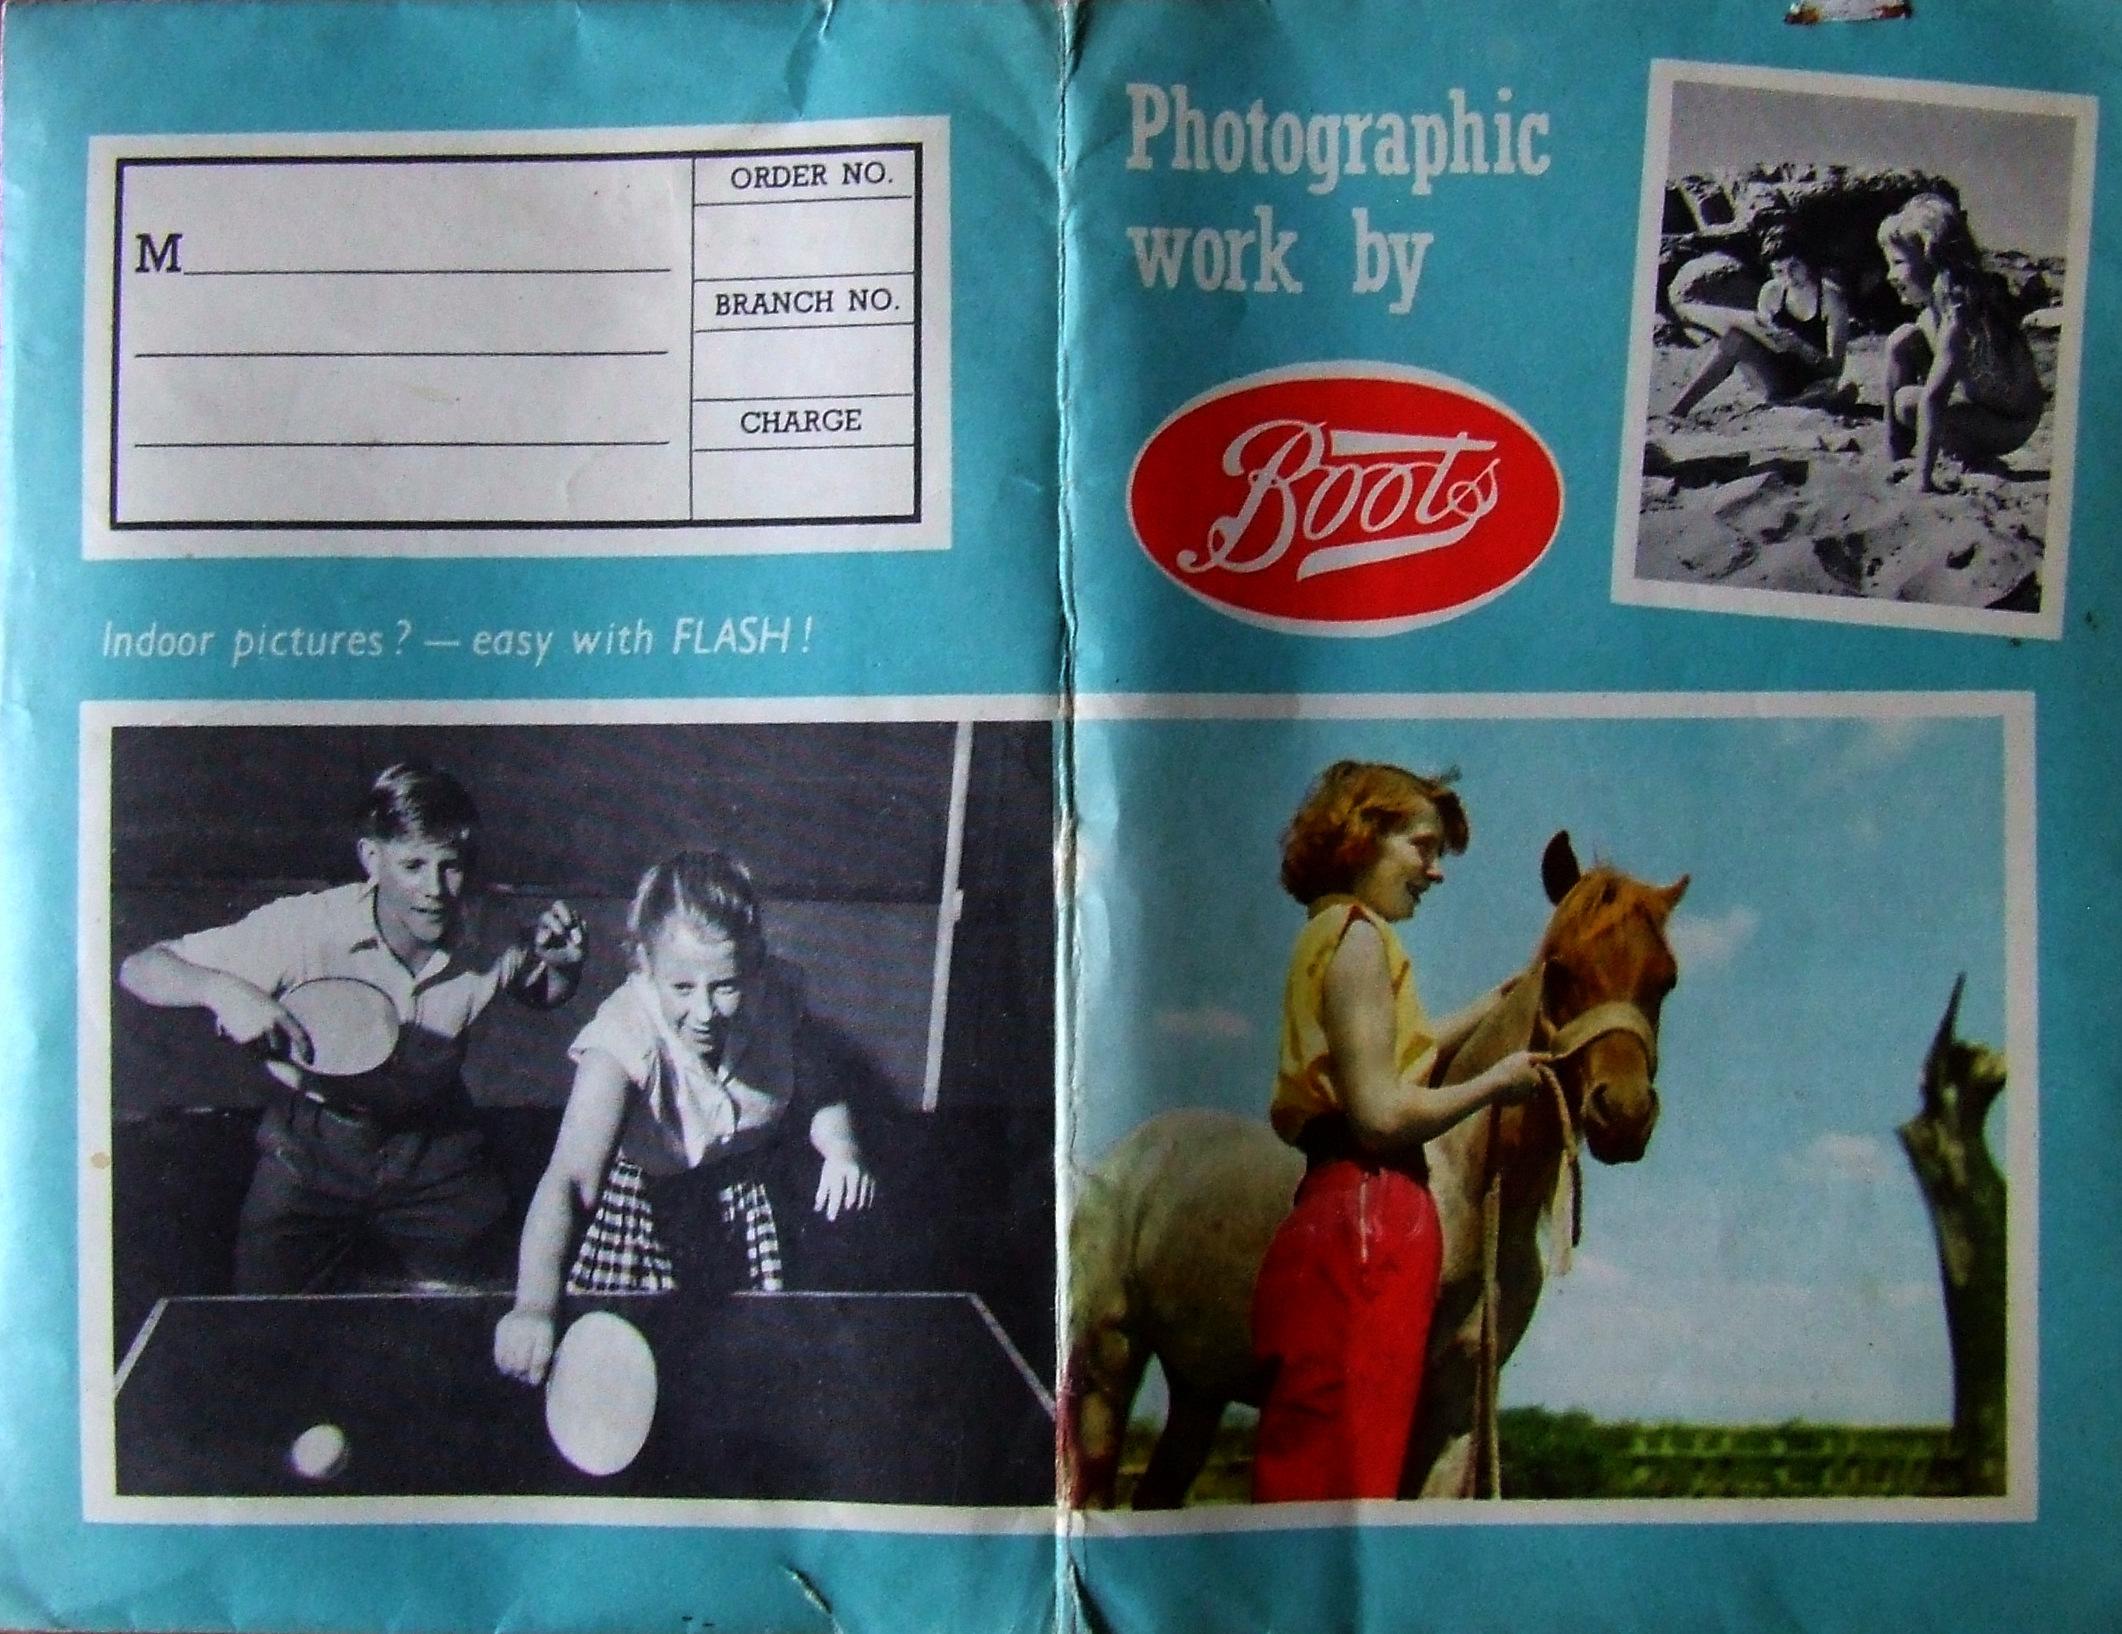 Boots Film Wallet - 1960's